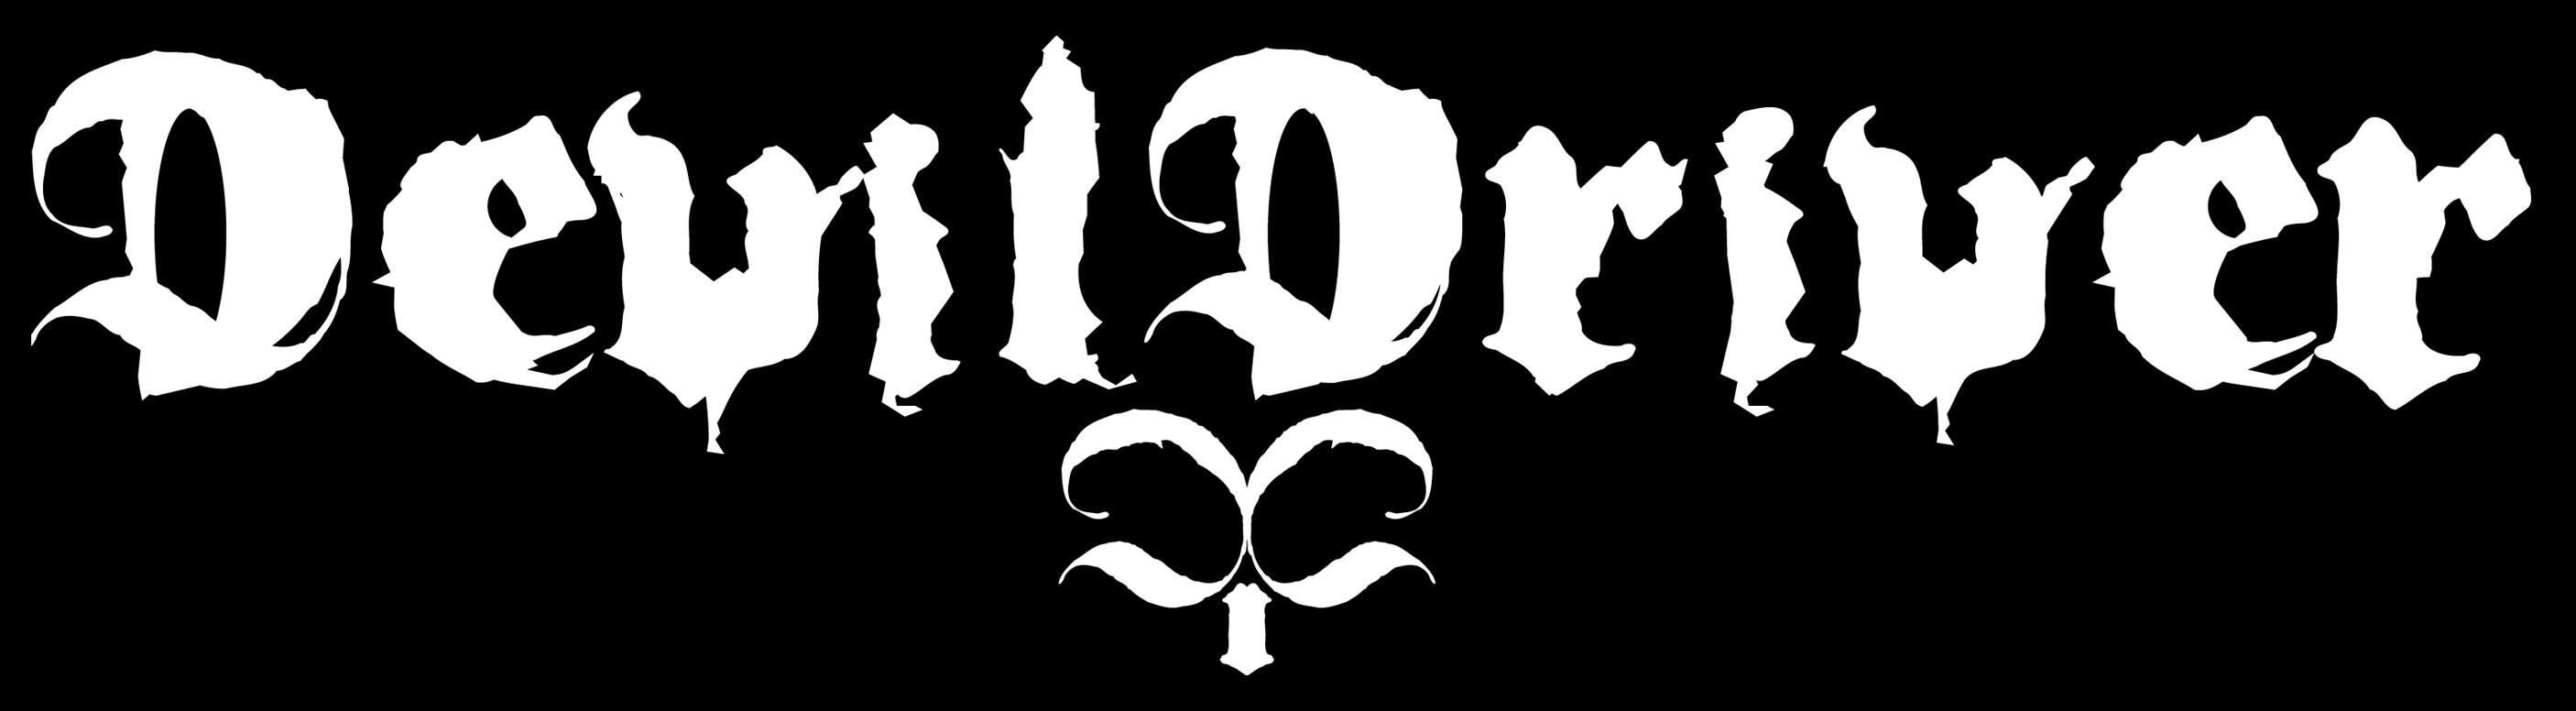 Devildriver - myspace